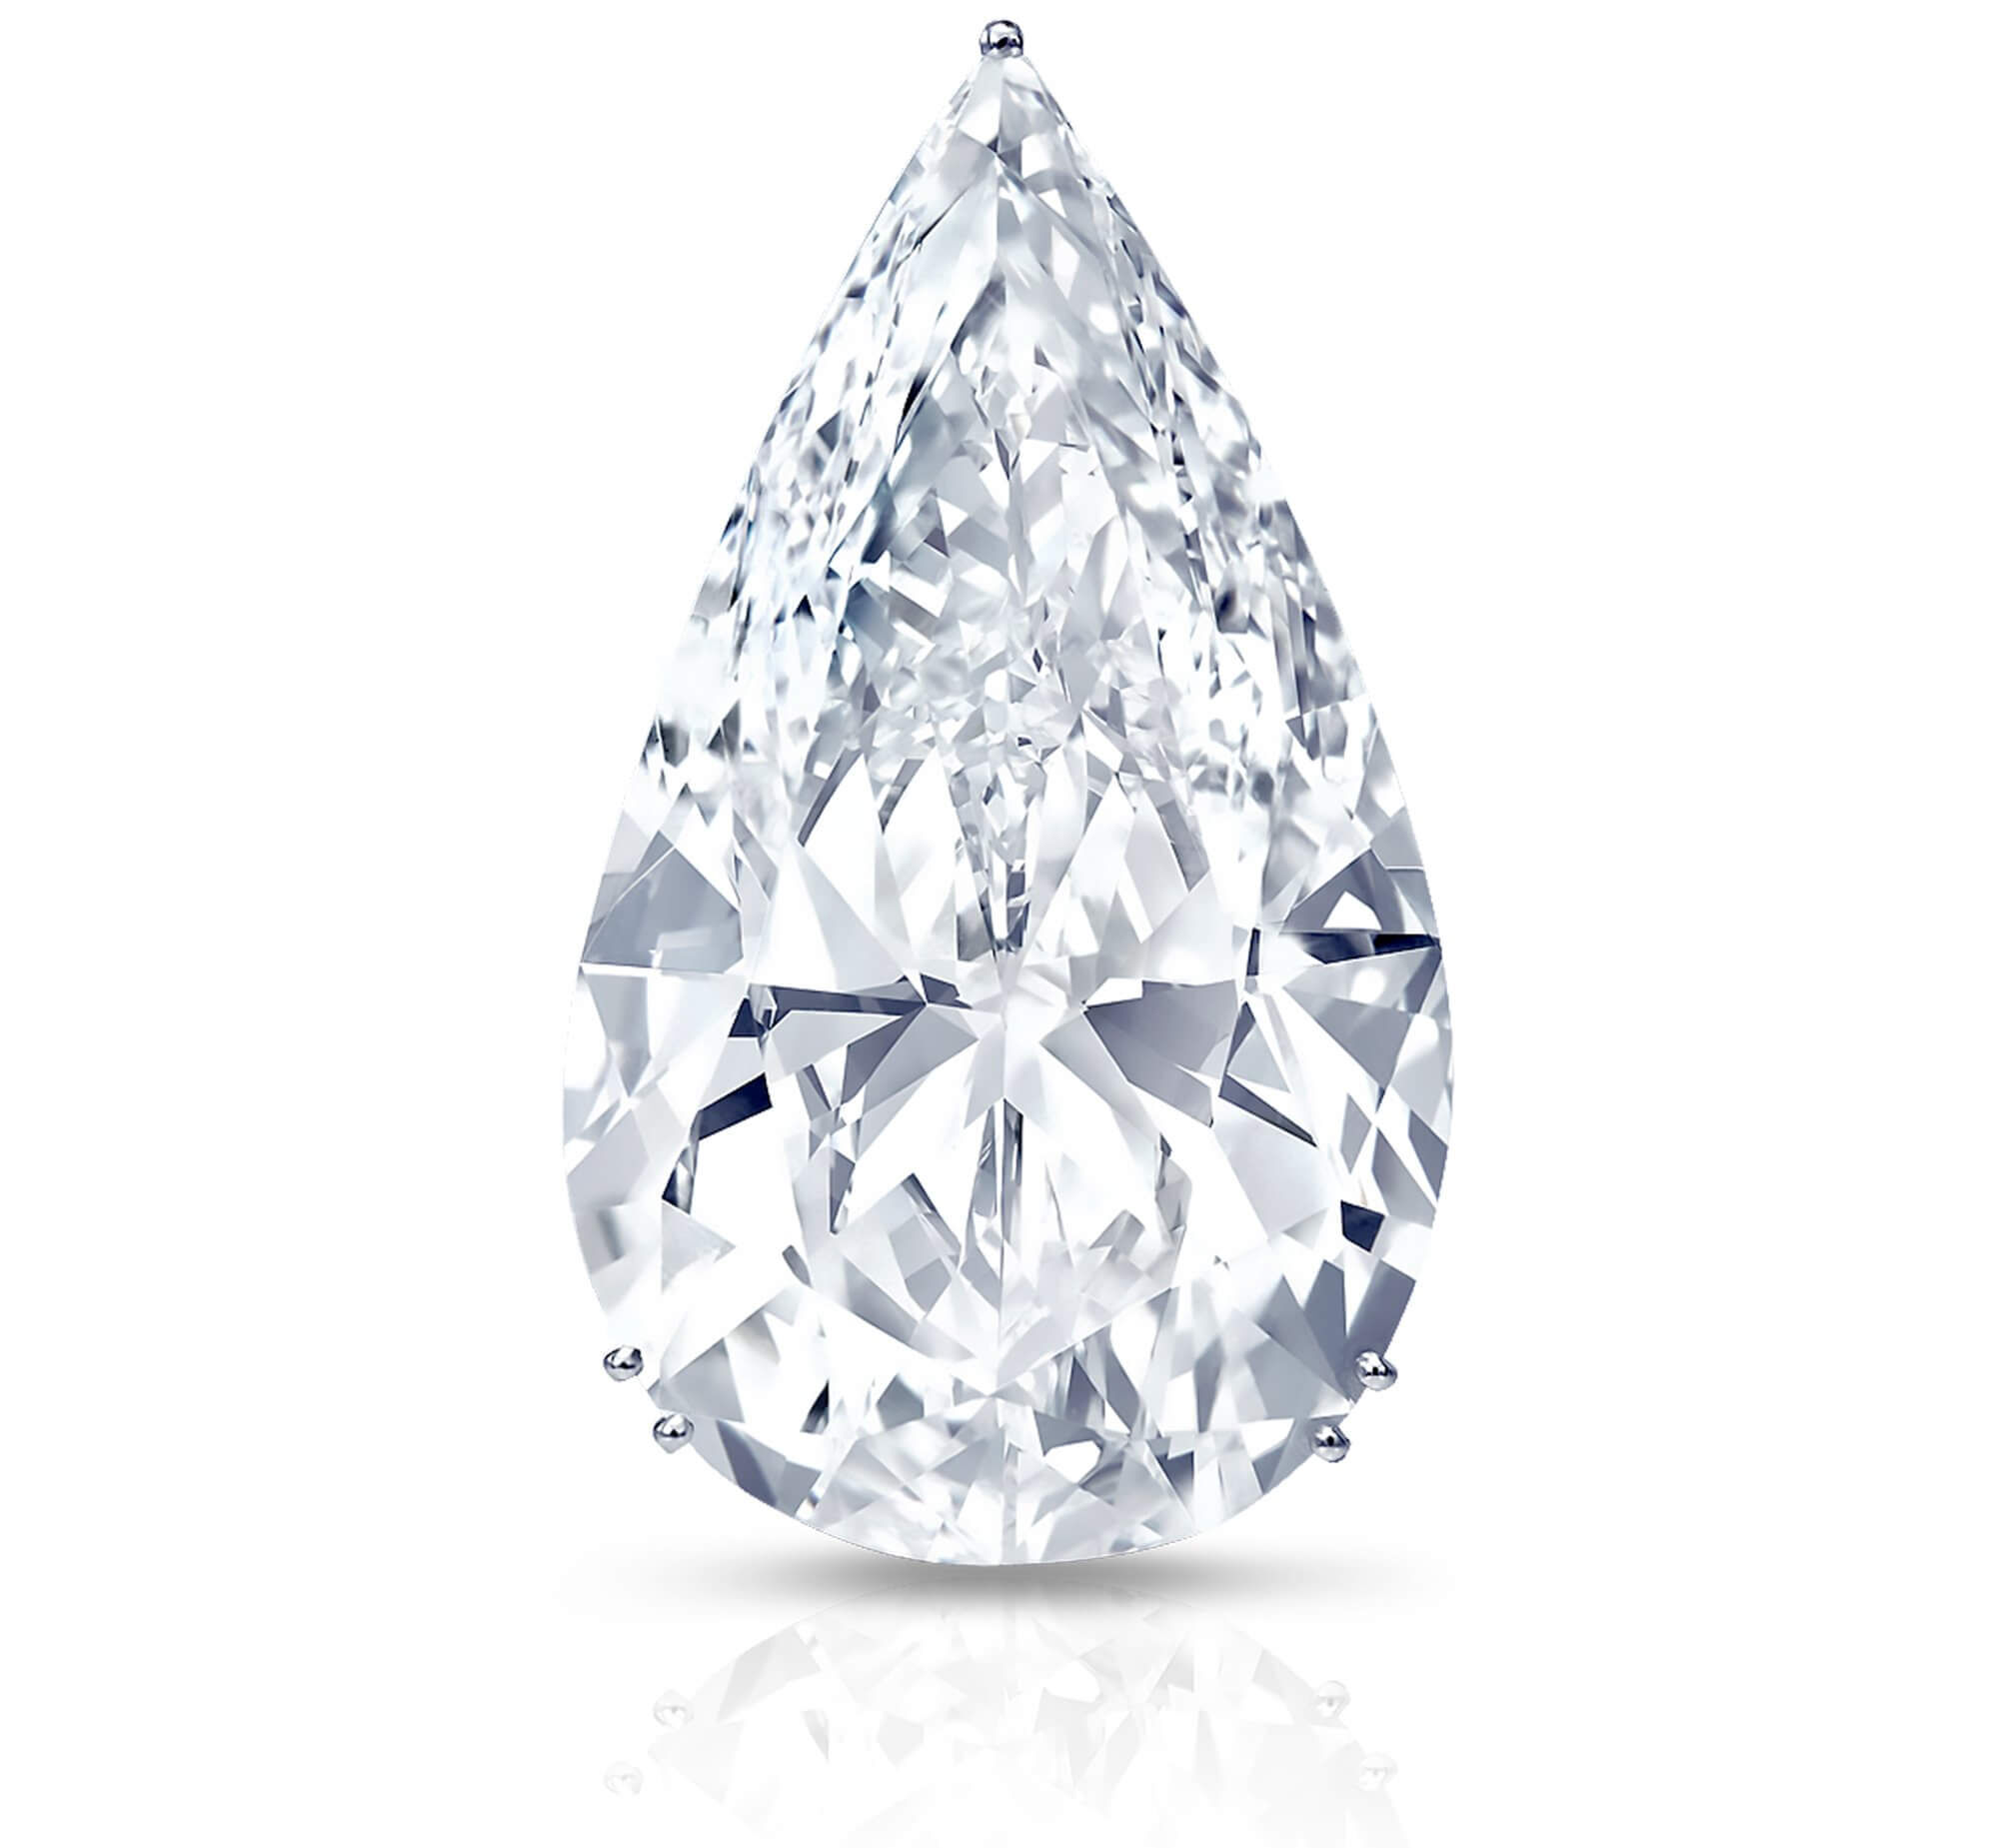 The 100 carat D flawless pear shape 'Graff Perfection' diamond